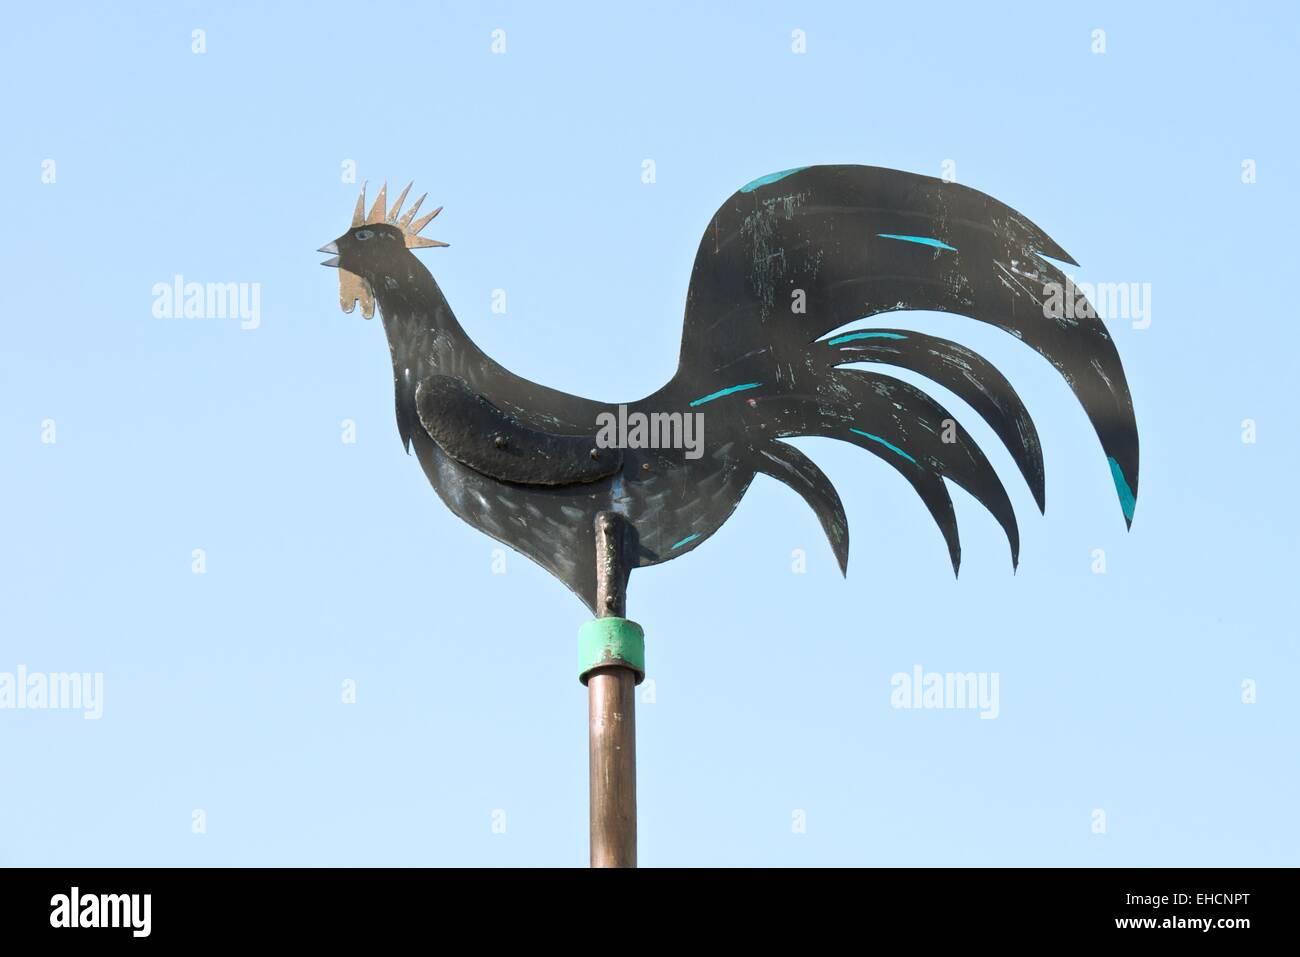 Wetterhahn , Metal rooster - Stock Image